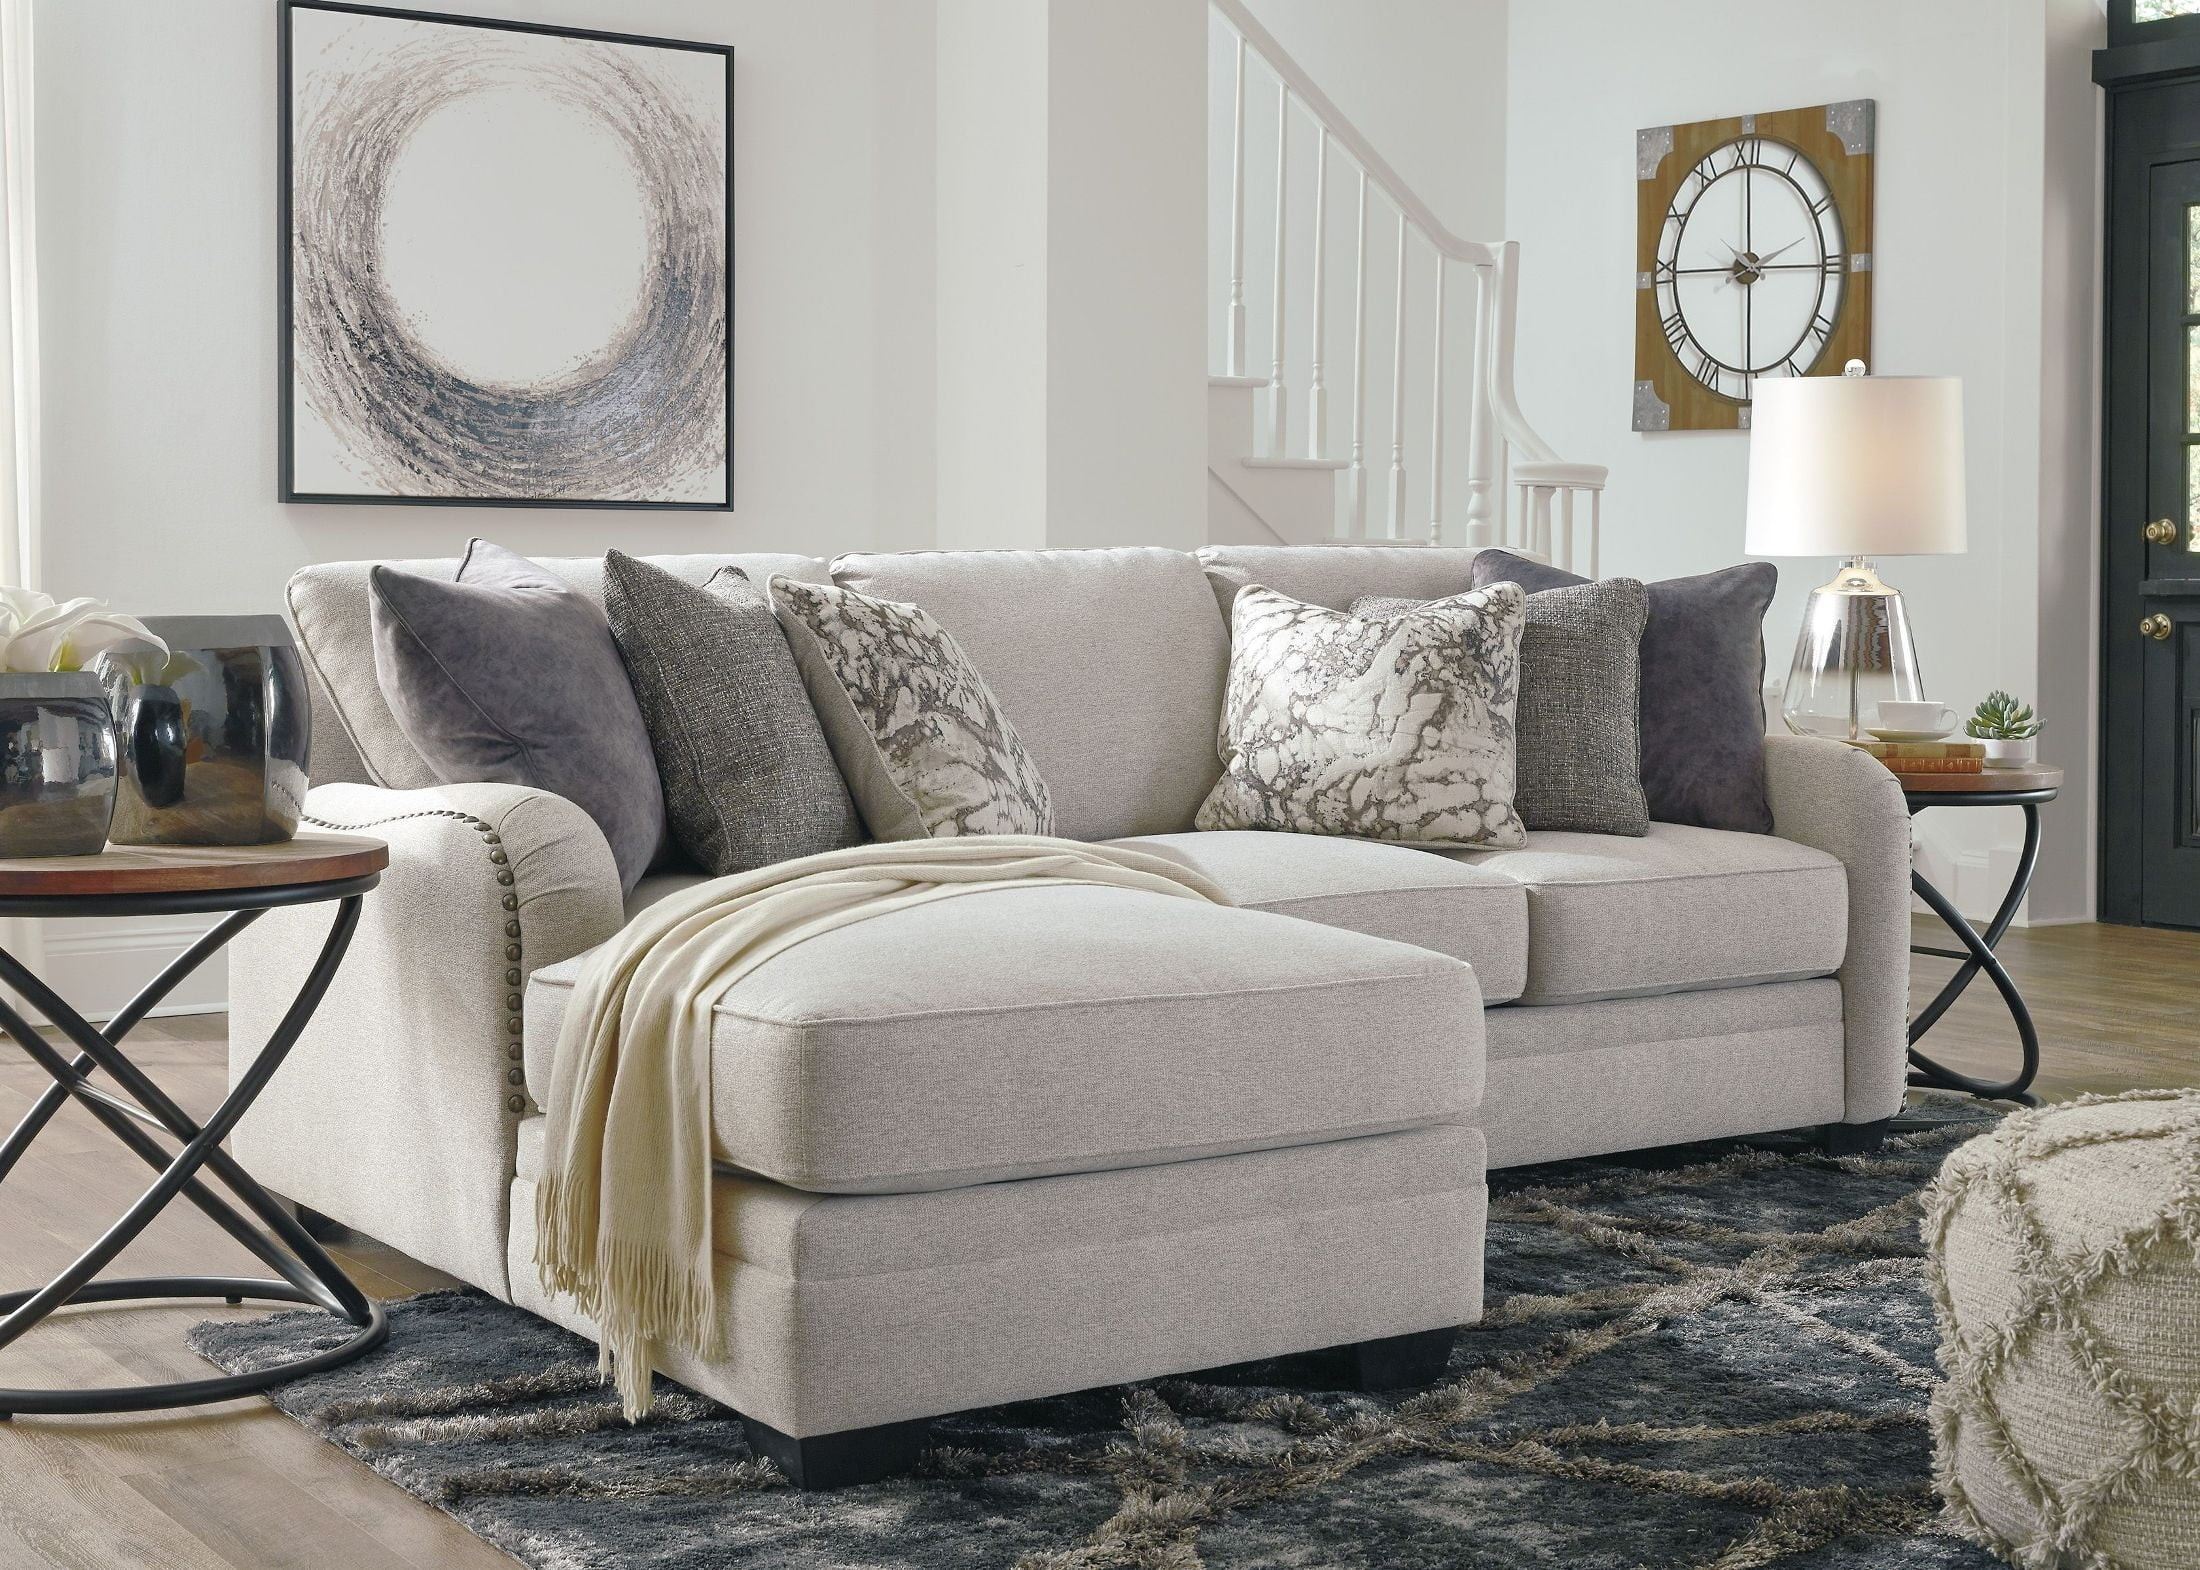 FurnitureETC | Furniture & More Dellara Chalk LAF Small ...